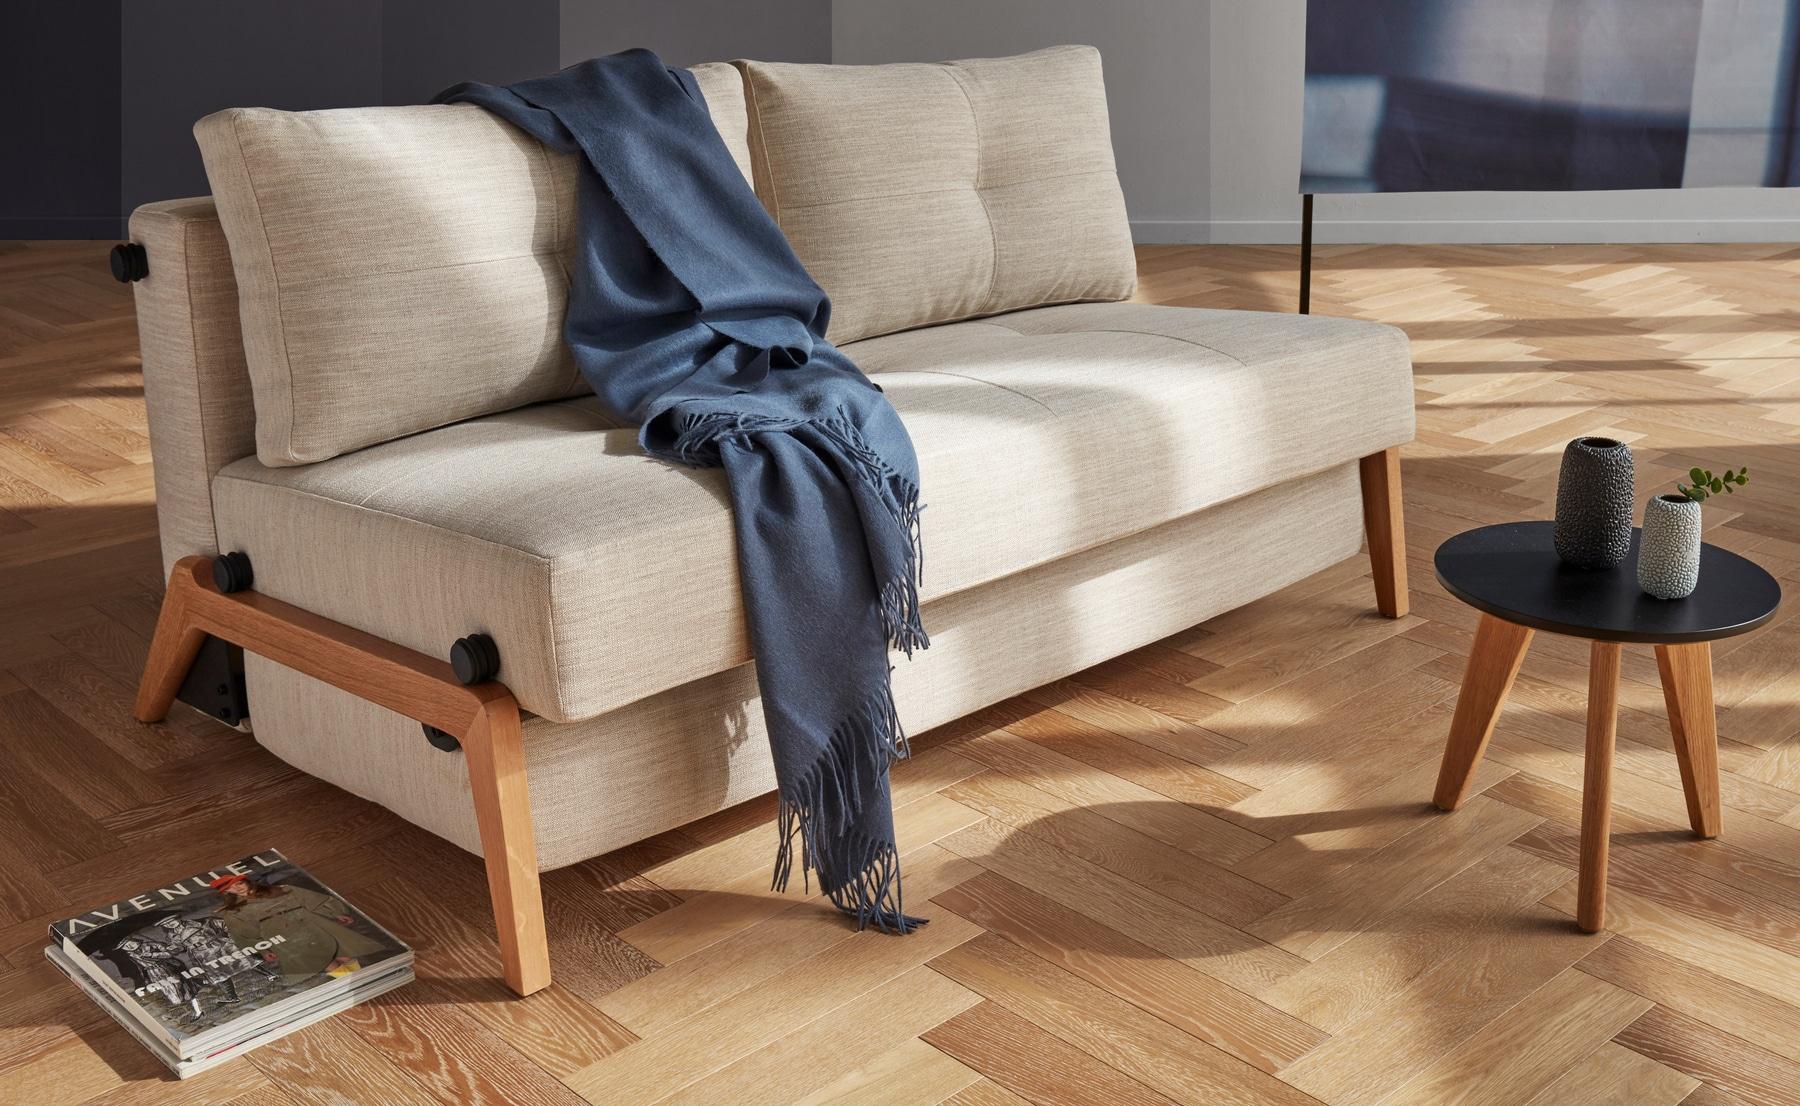 Cubed 02 140 cm Wooden Legs